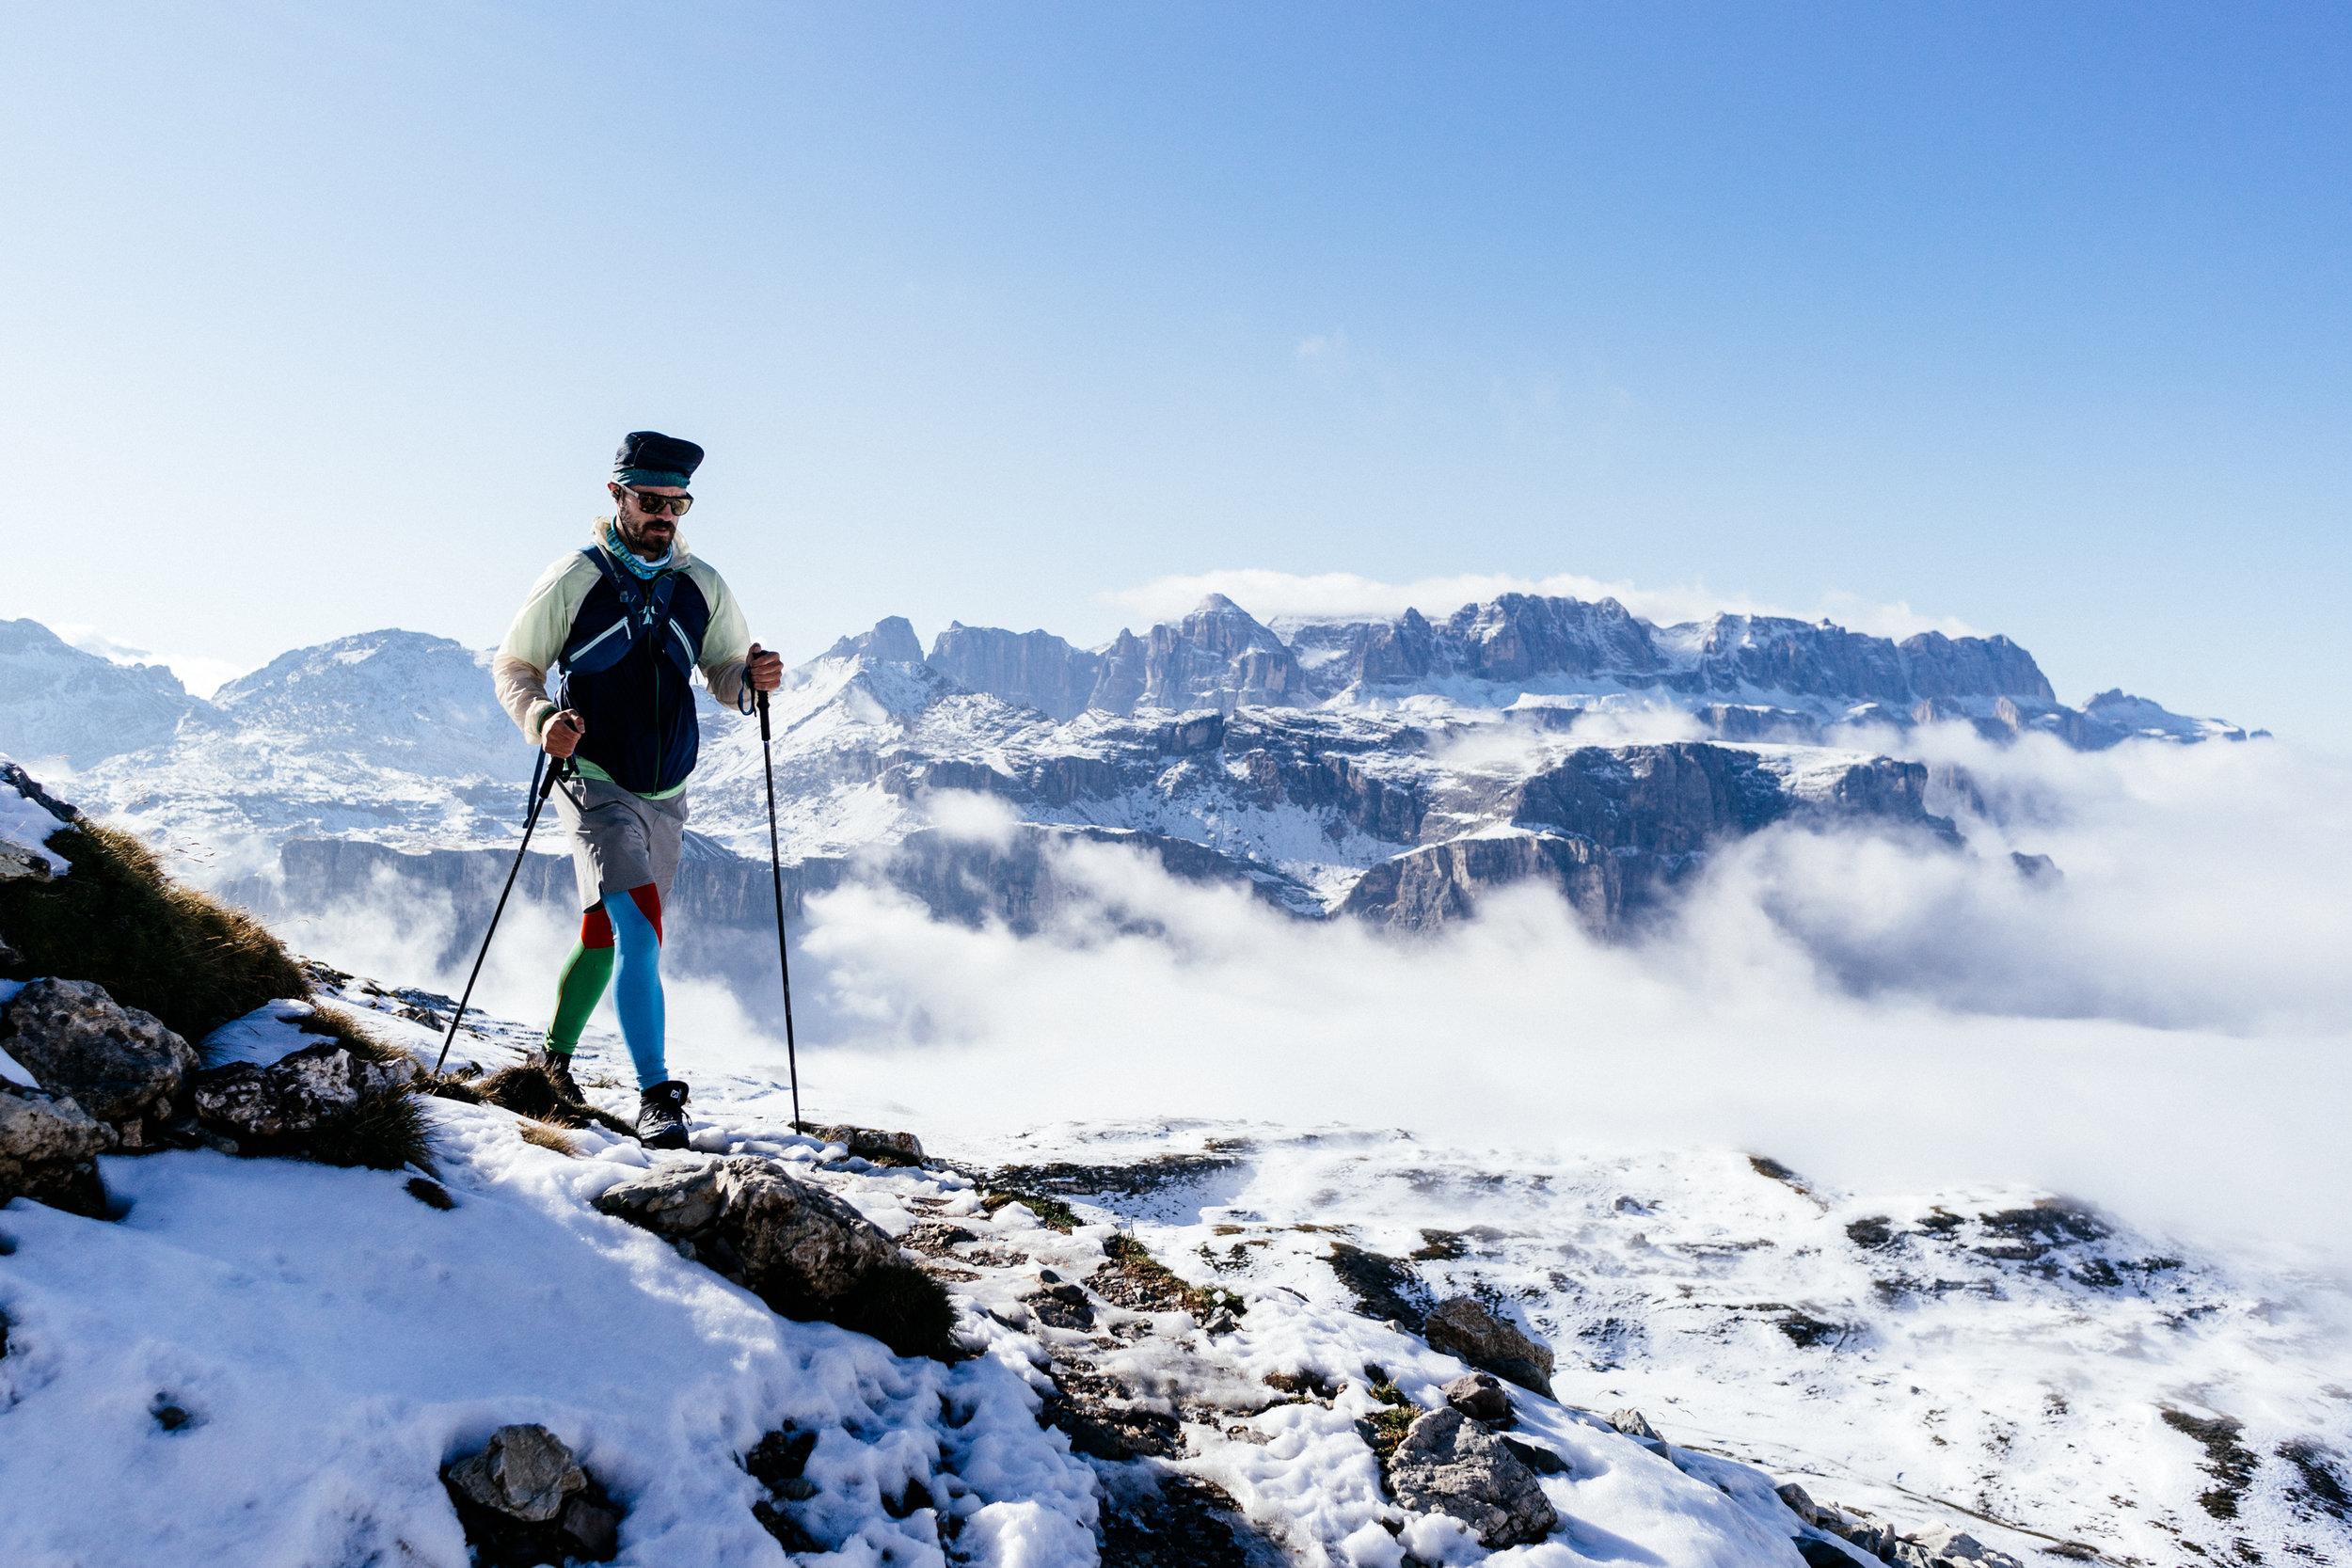 Dolomites-ChrisBrinleeJr-SEP17-109.jpg